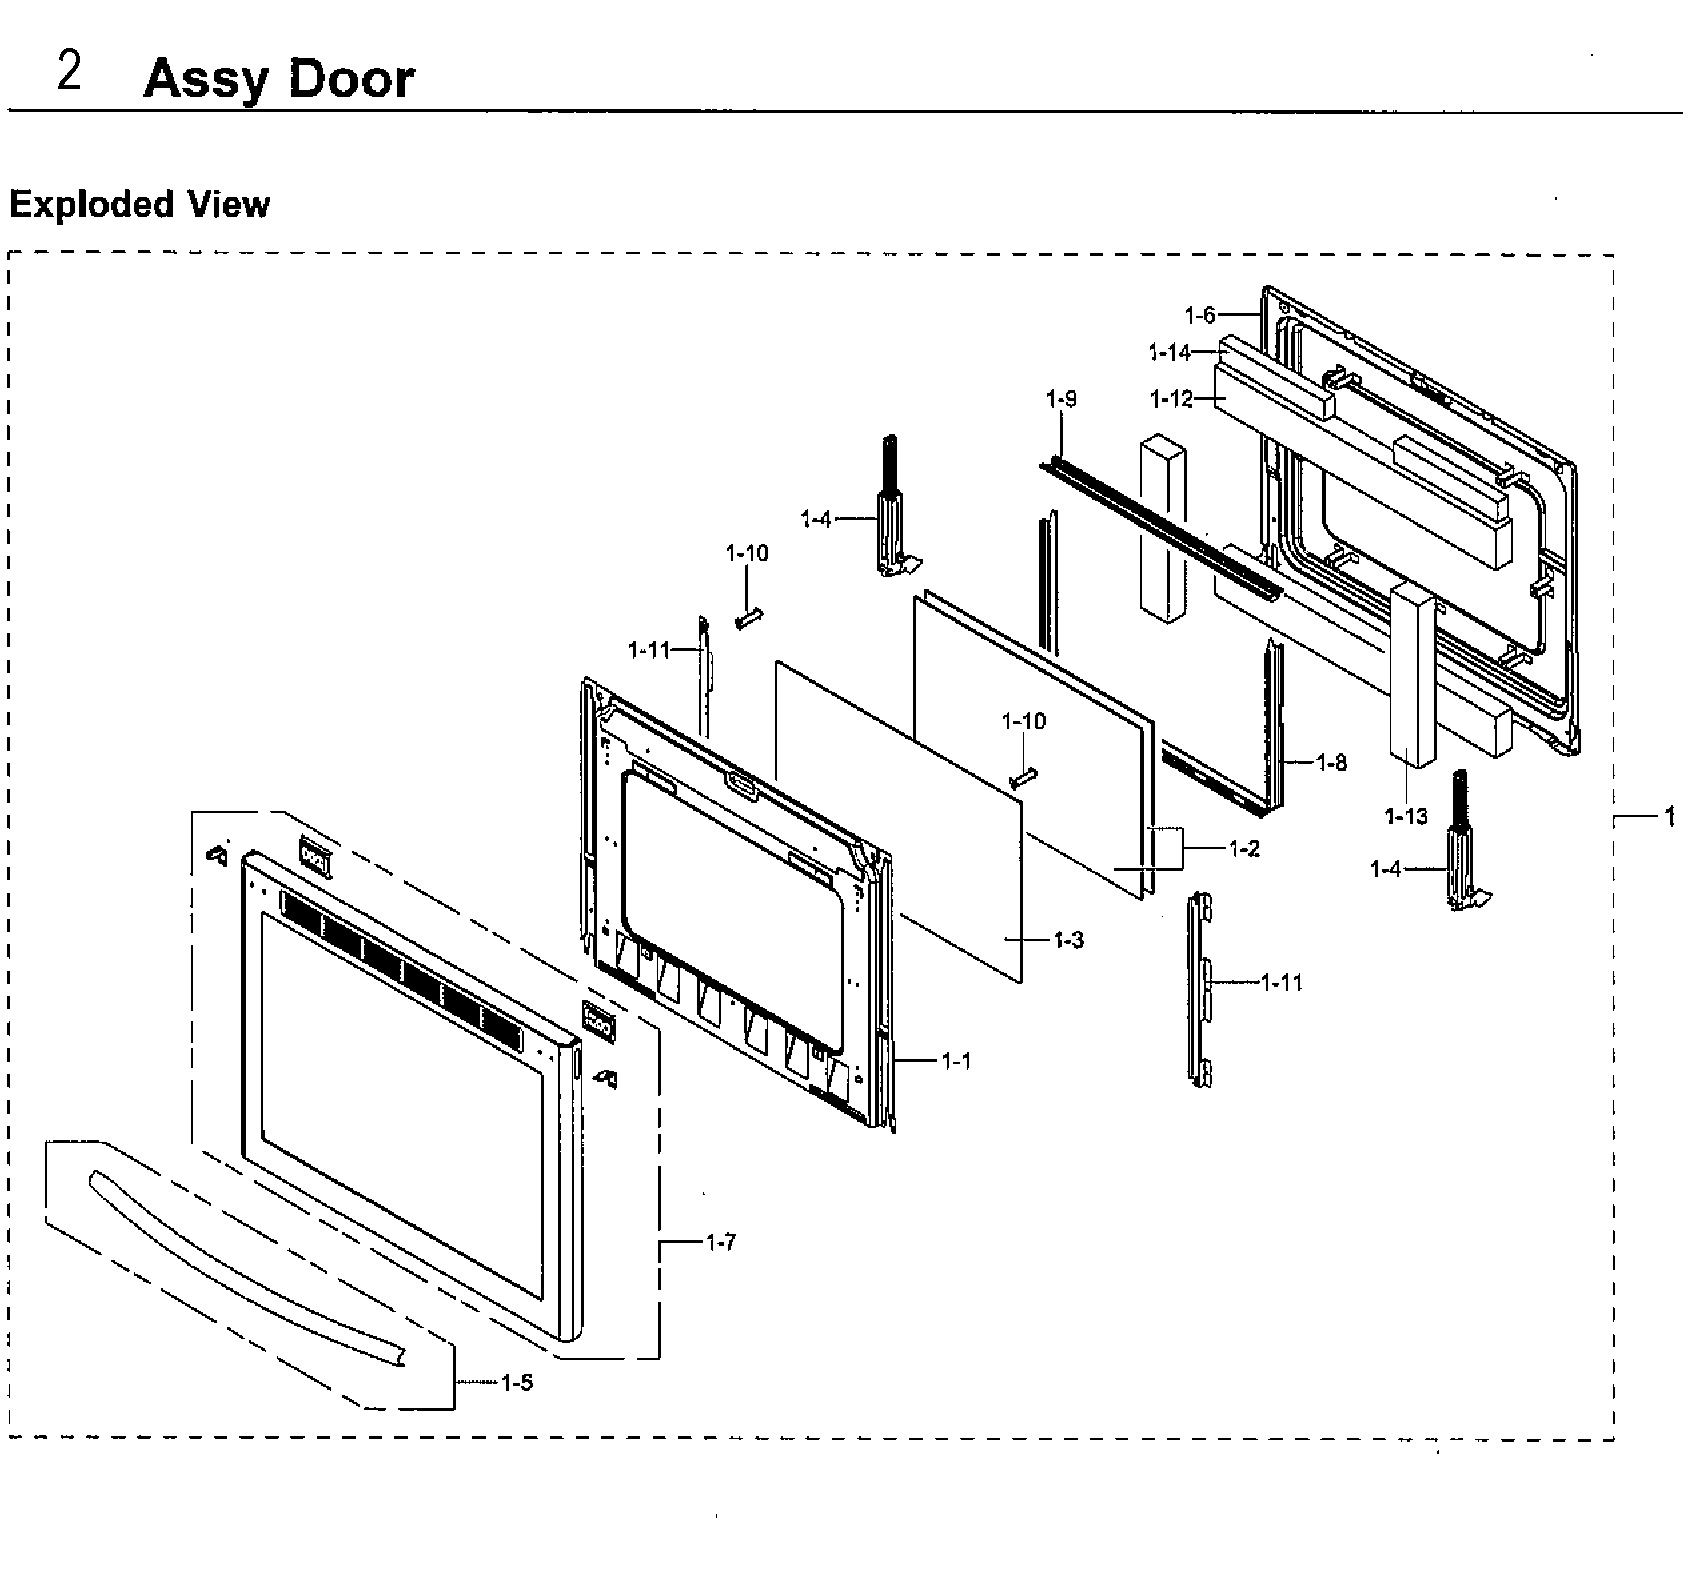 Samsung model NX58H9950WS/AA-01 slide-in range, gas